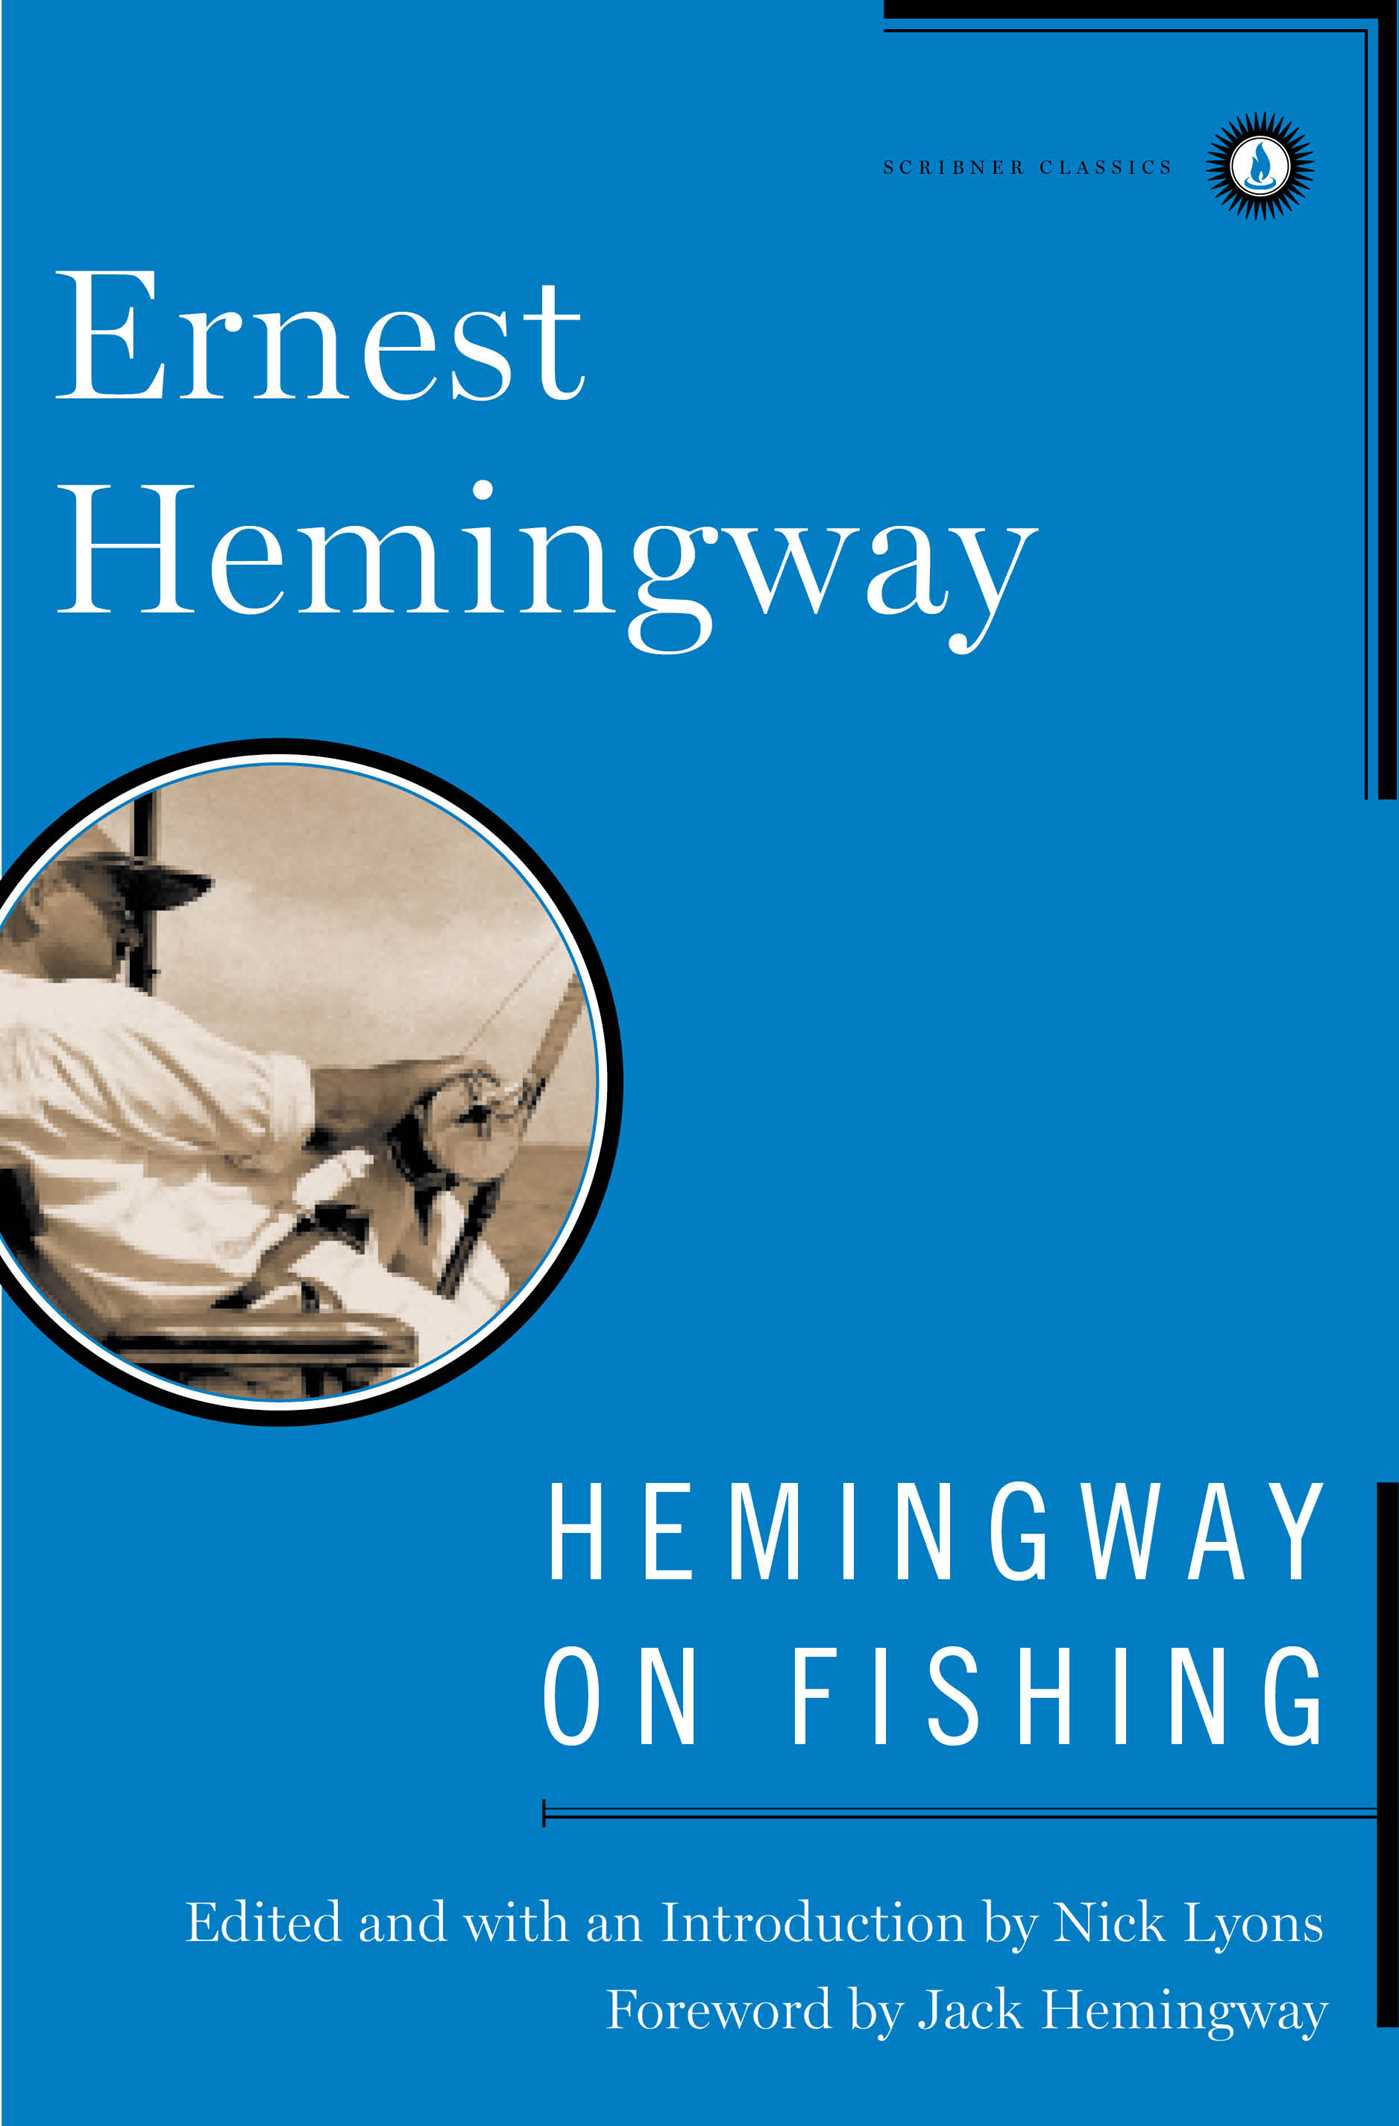 Hemingway on fishing 9781476716428 hr